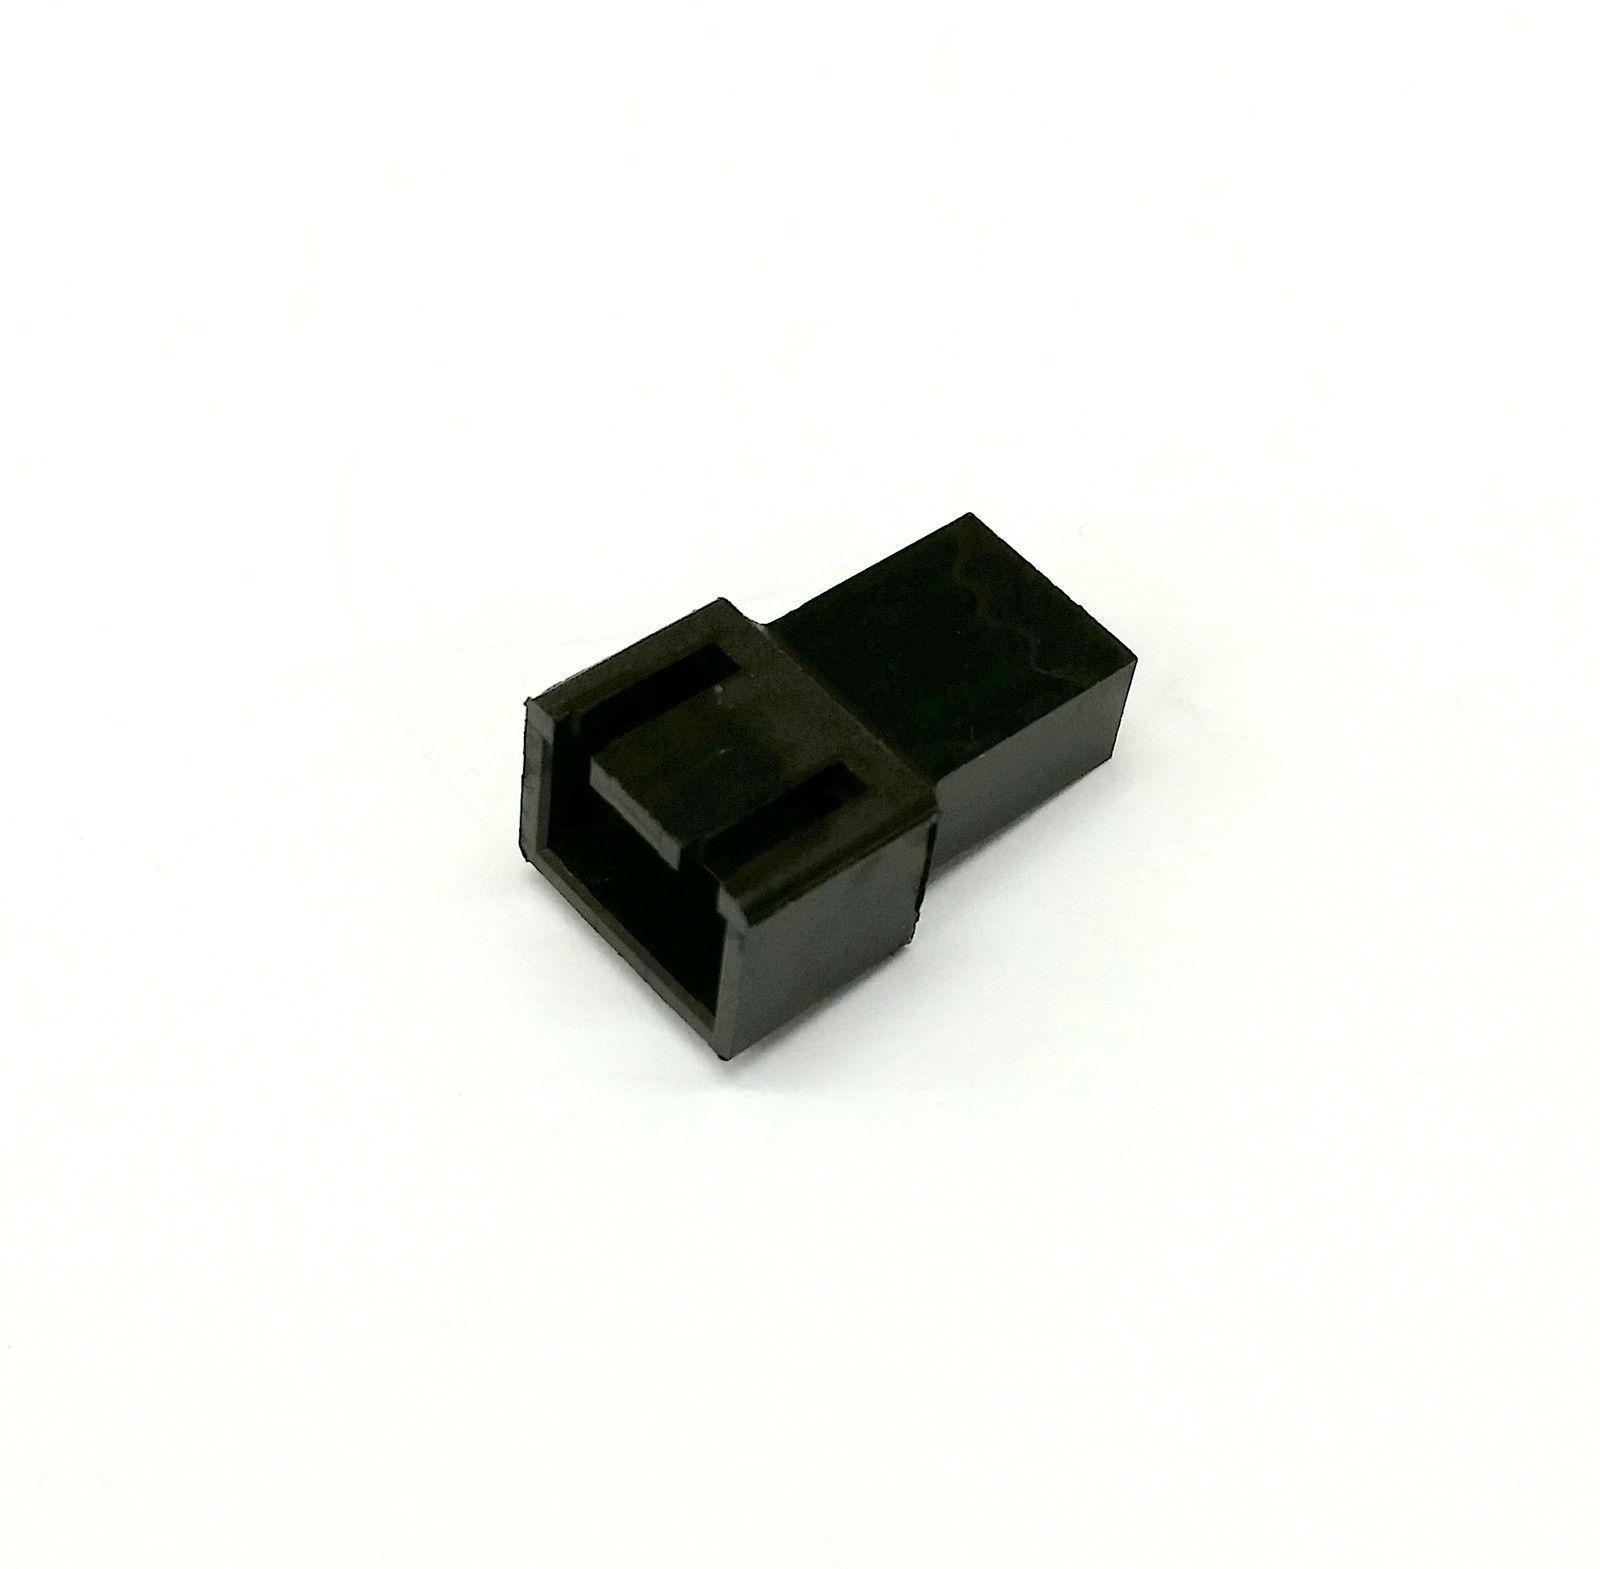 MALE & FEMALE 3 PIN PC FAN LED POWER CONNECTORS - 1 OF EACH- BLACK INC PINS